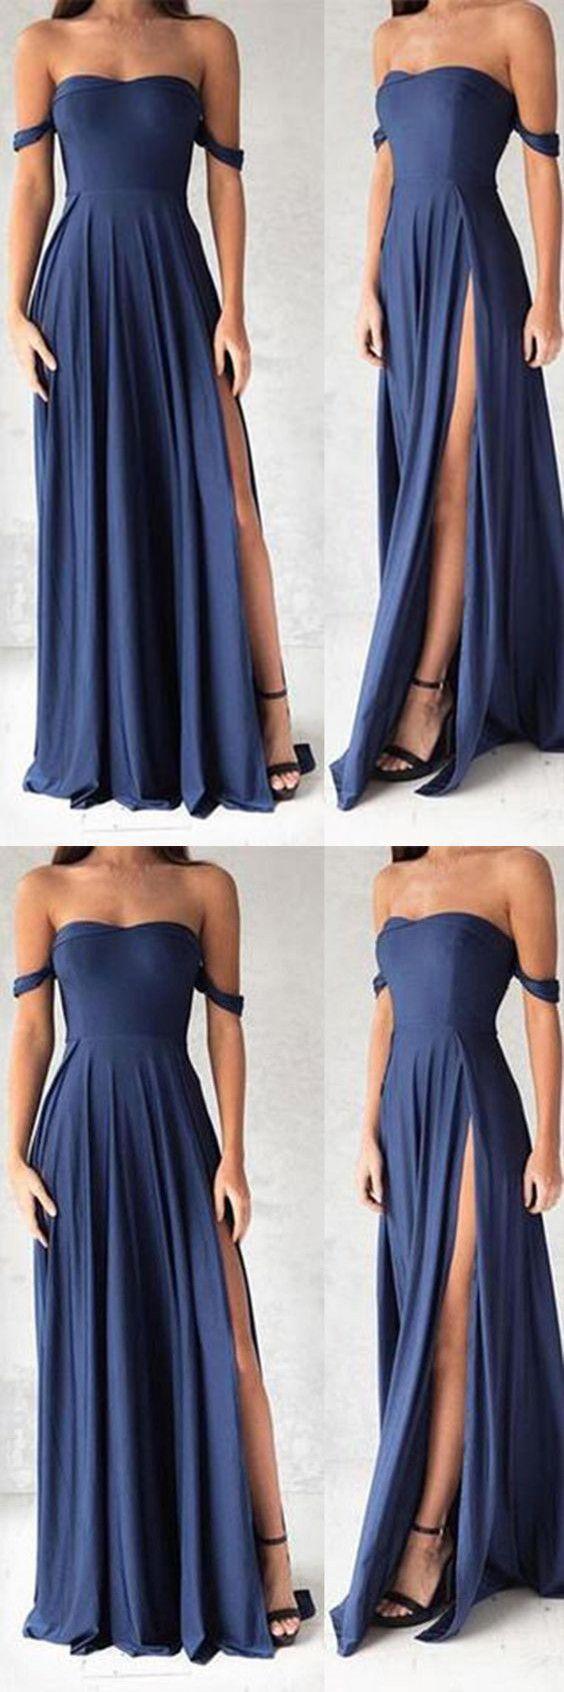 Navy Blue Prom Dresses,Elegant Evening Dresses,Long Formal Gowns ...